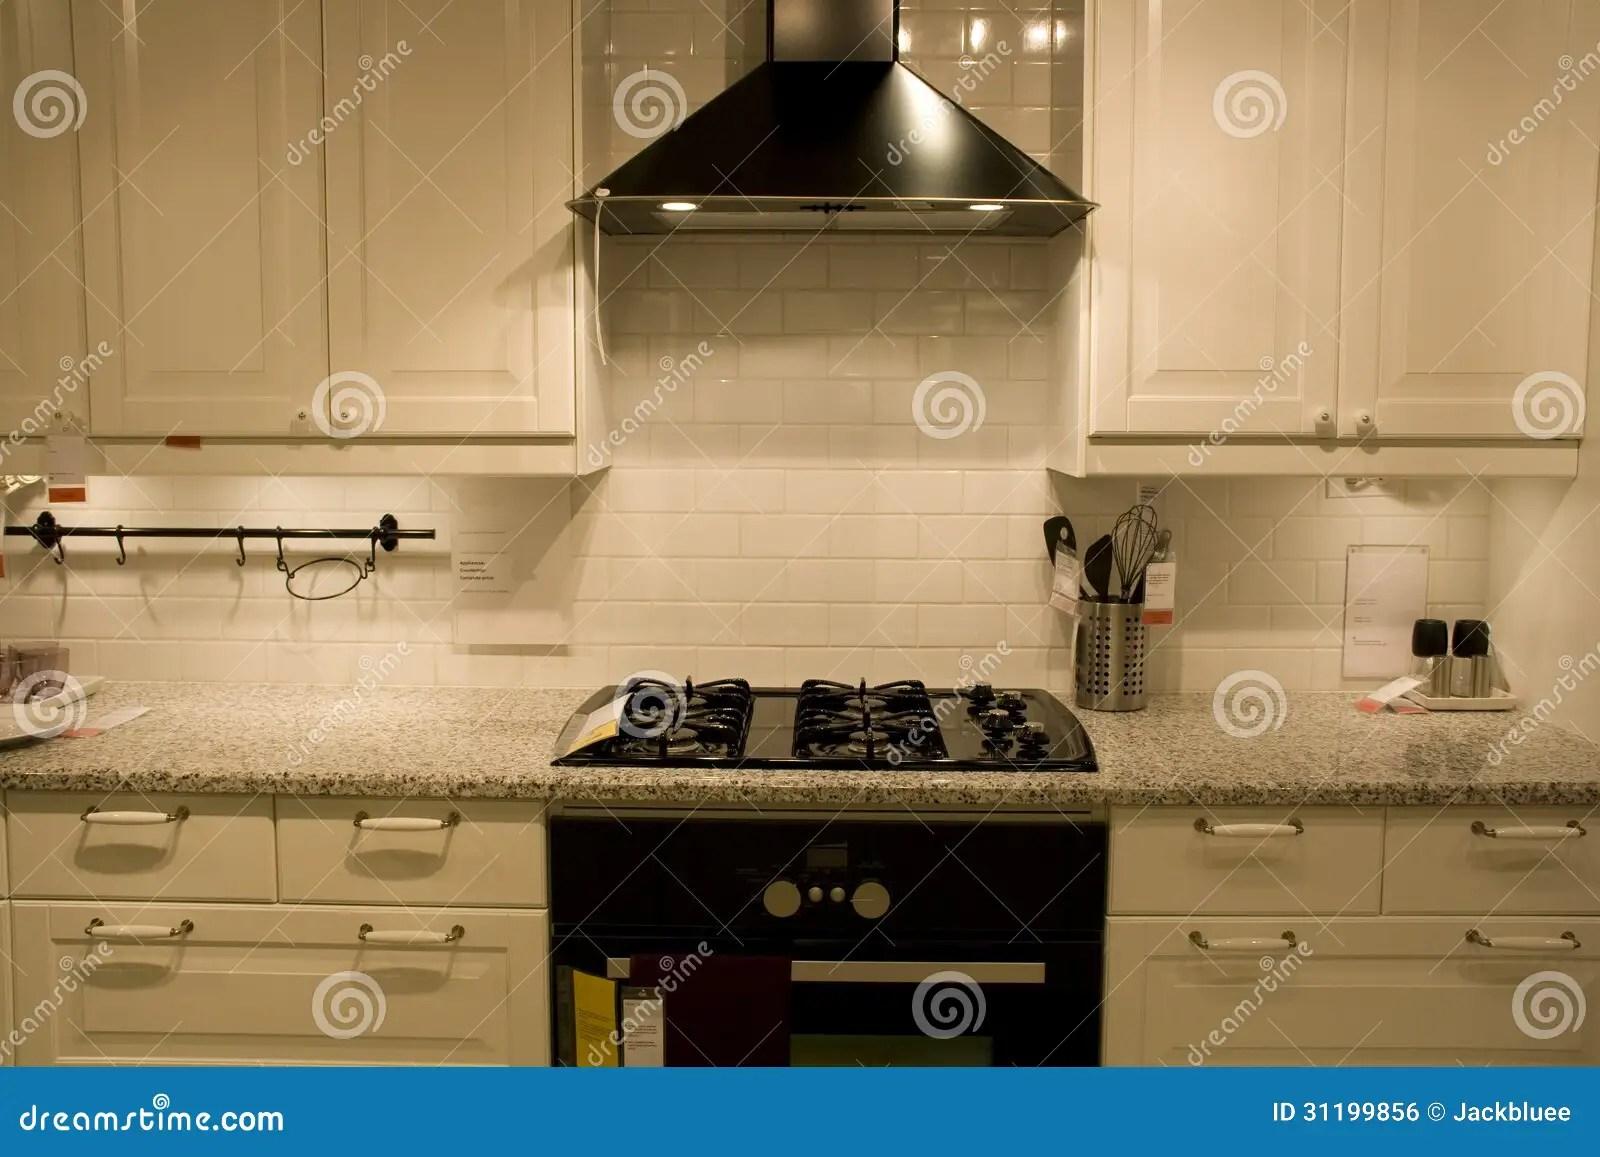 home and kitchen stores assembled cabinets 豪华家庭厨房室内设计库存照片 图片包括有照明设备 厨房 顶层 装饰 豪华家庭厨房室内设计在商店